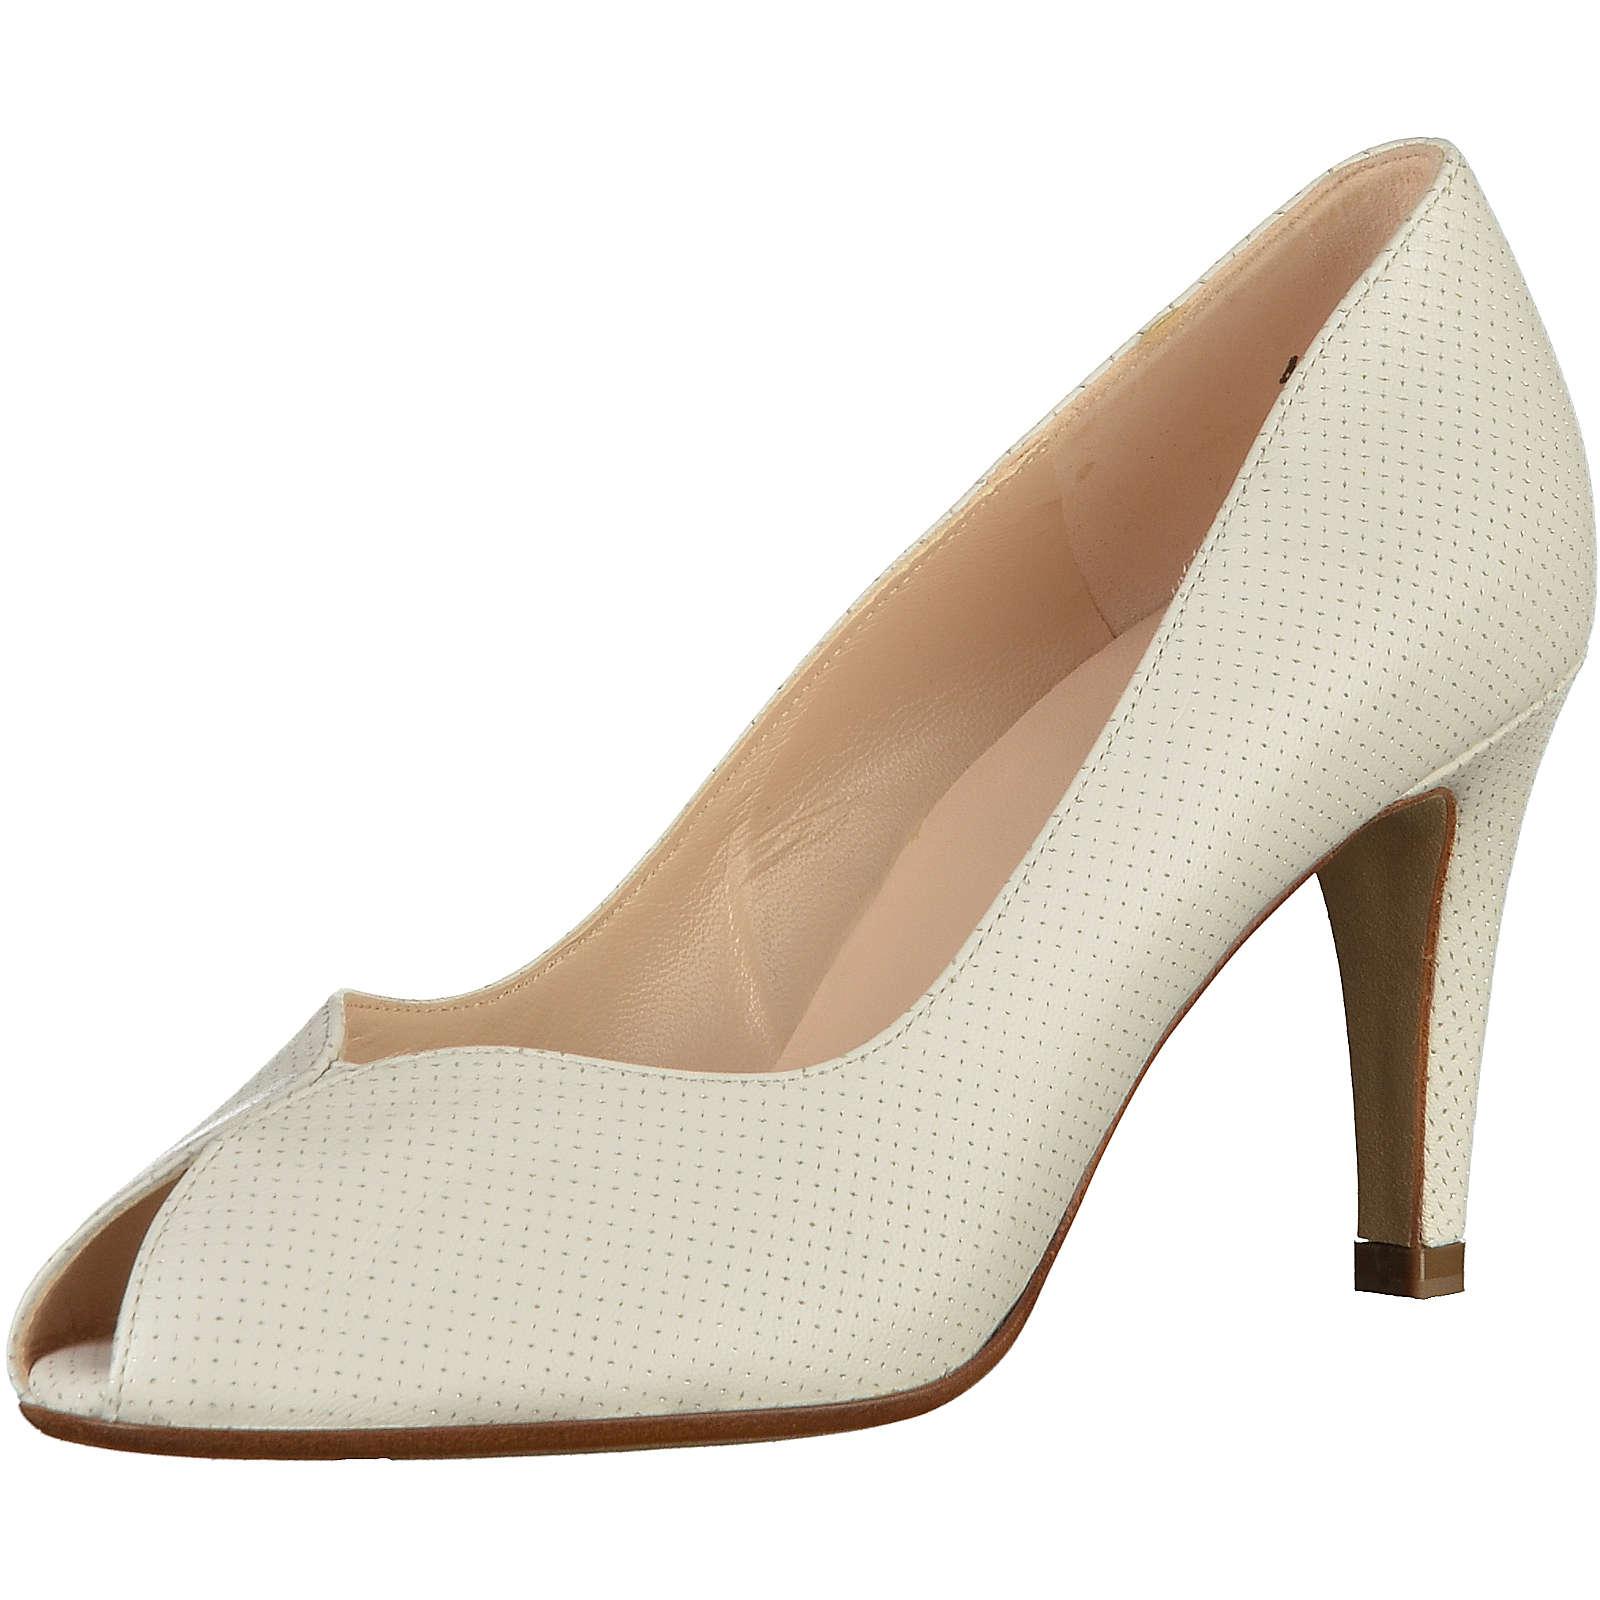 48eb4bce0e7e Rabatt-Preisvergleich.de - Mode|Damenmode|Damen Schuhe|Pumps|Peeptoes